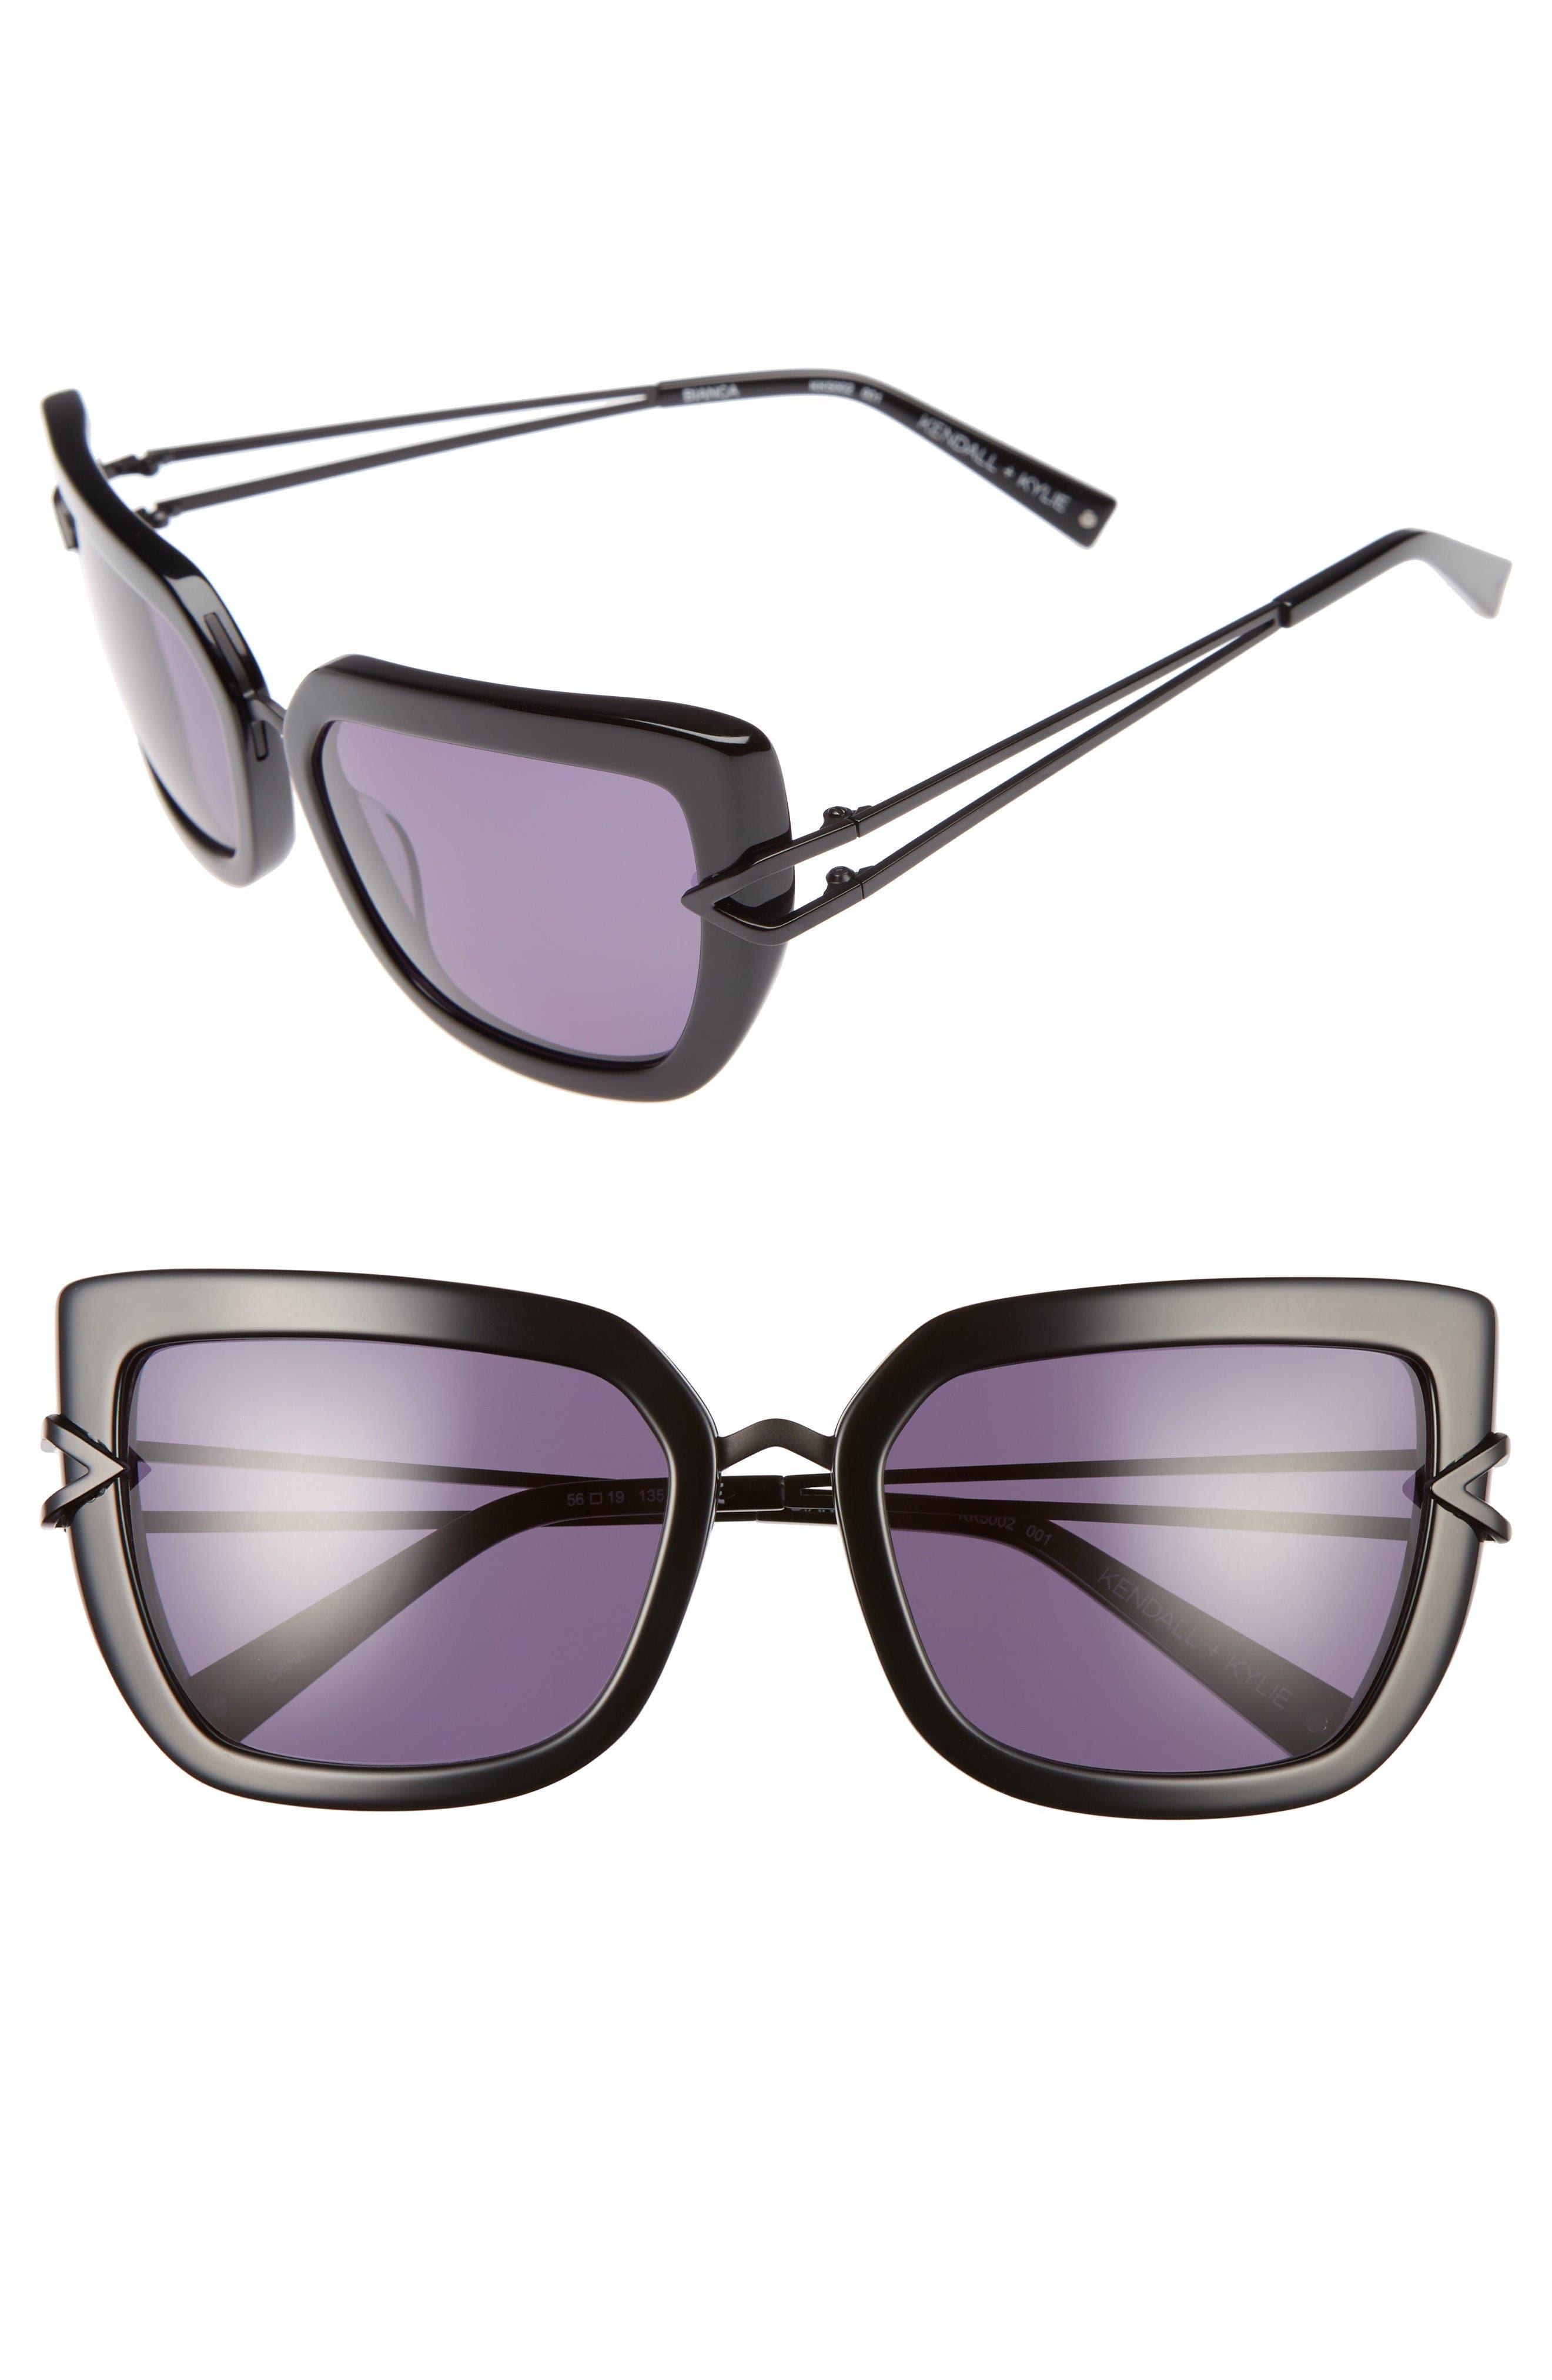 Bianca 56mm Cat Eye Sunglasses,                         Main,                         color, Shiny Black/ Matte Satin Black